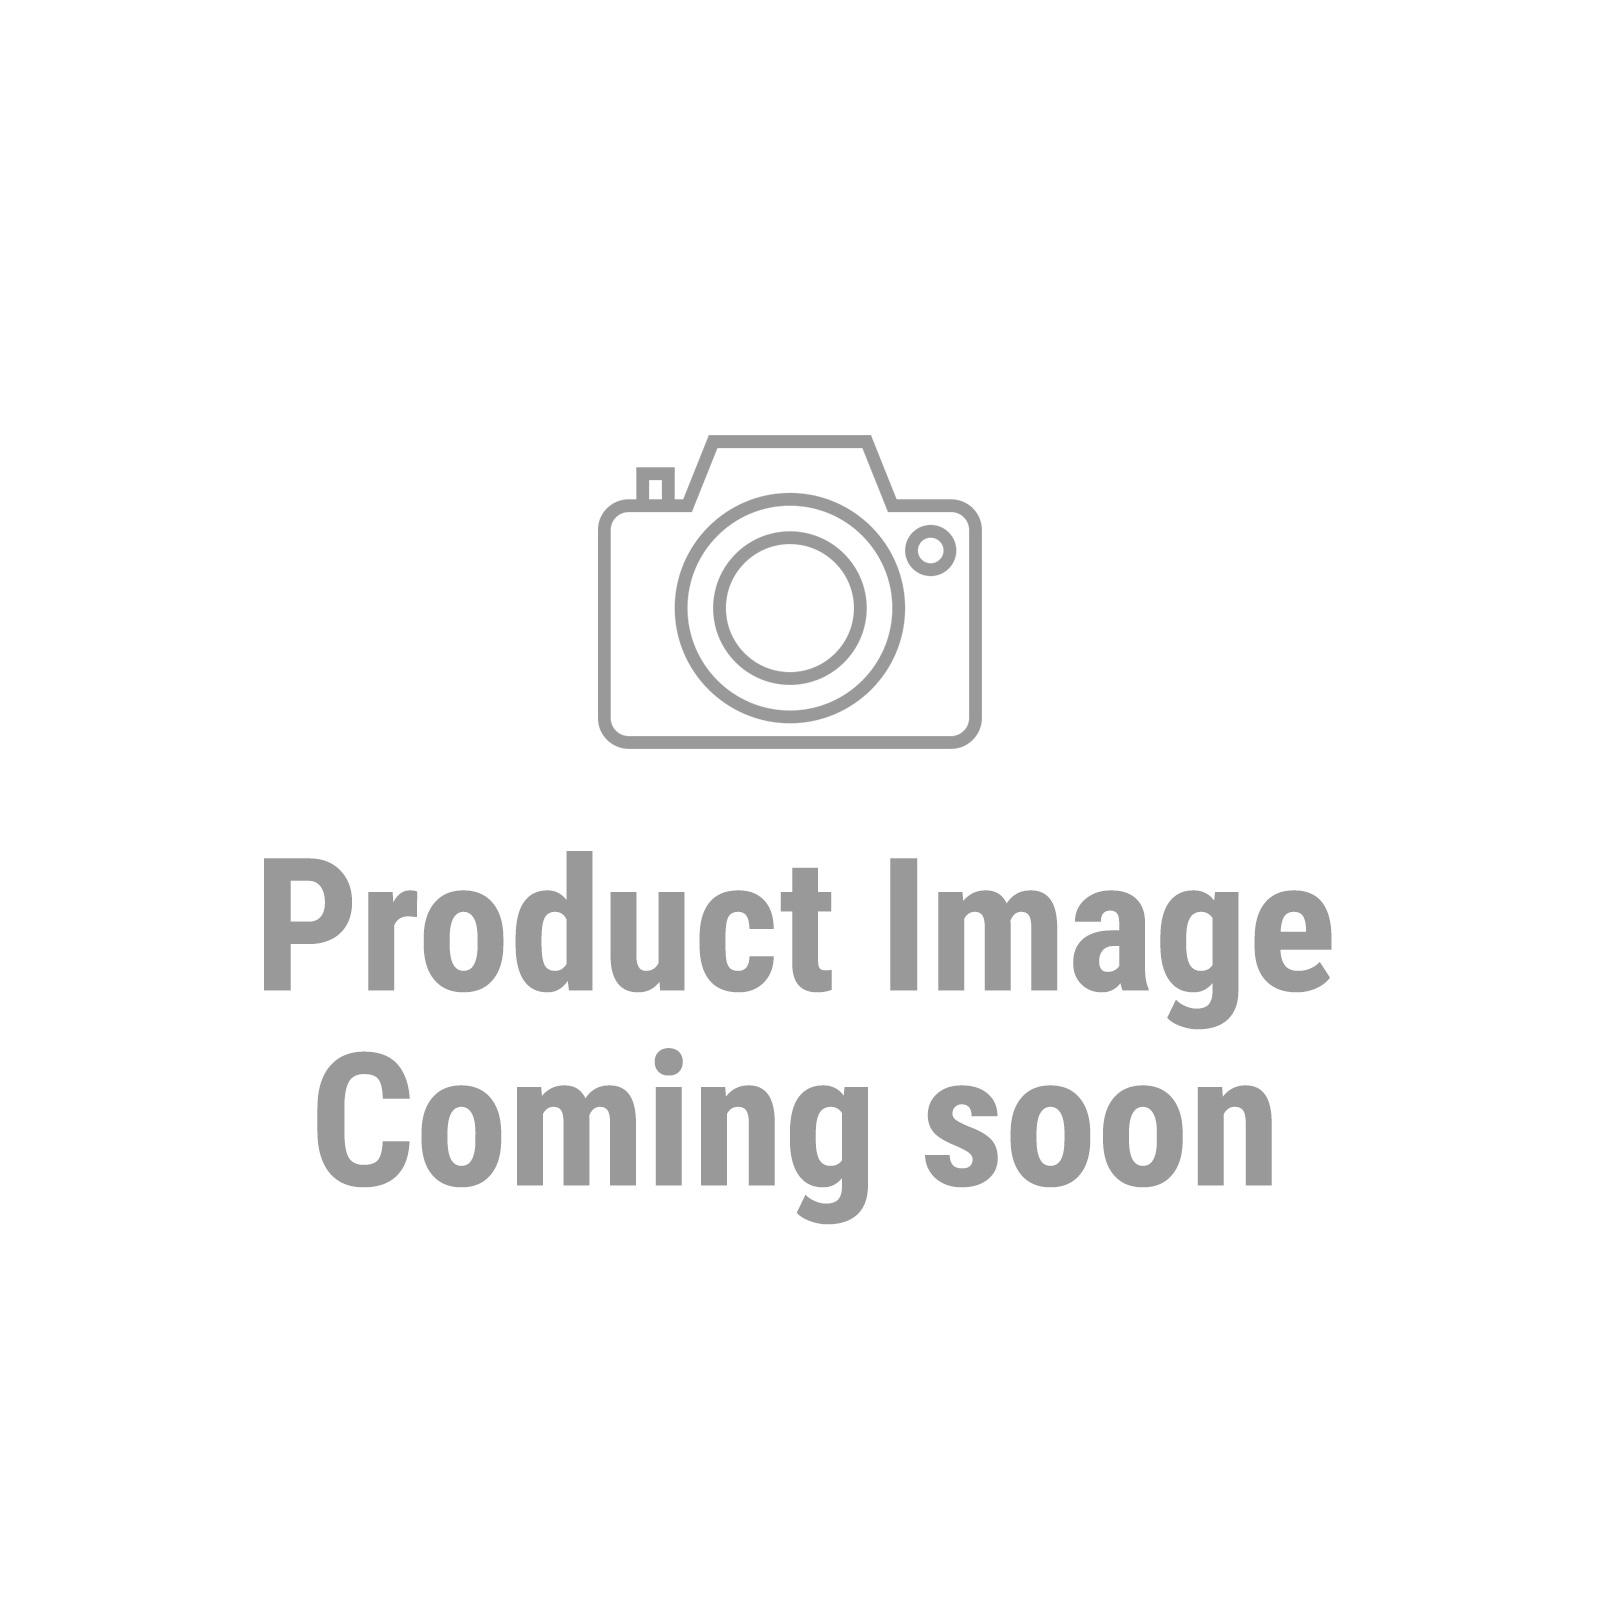 Truma Mover Smart M SET | 1800Kg | halbautomatisch | 13% | Trennschalter Sika